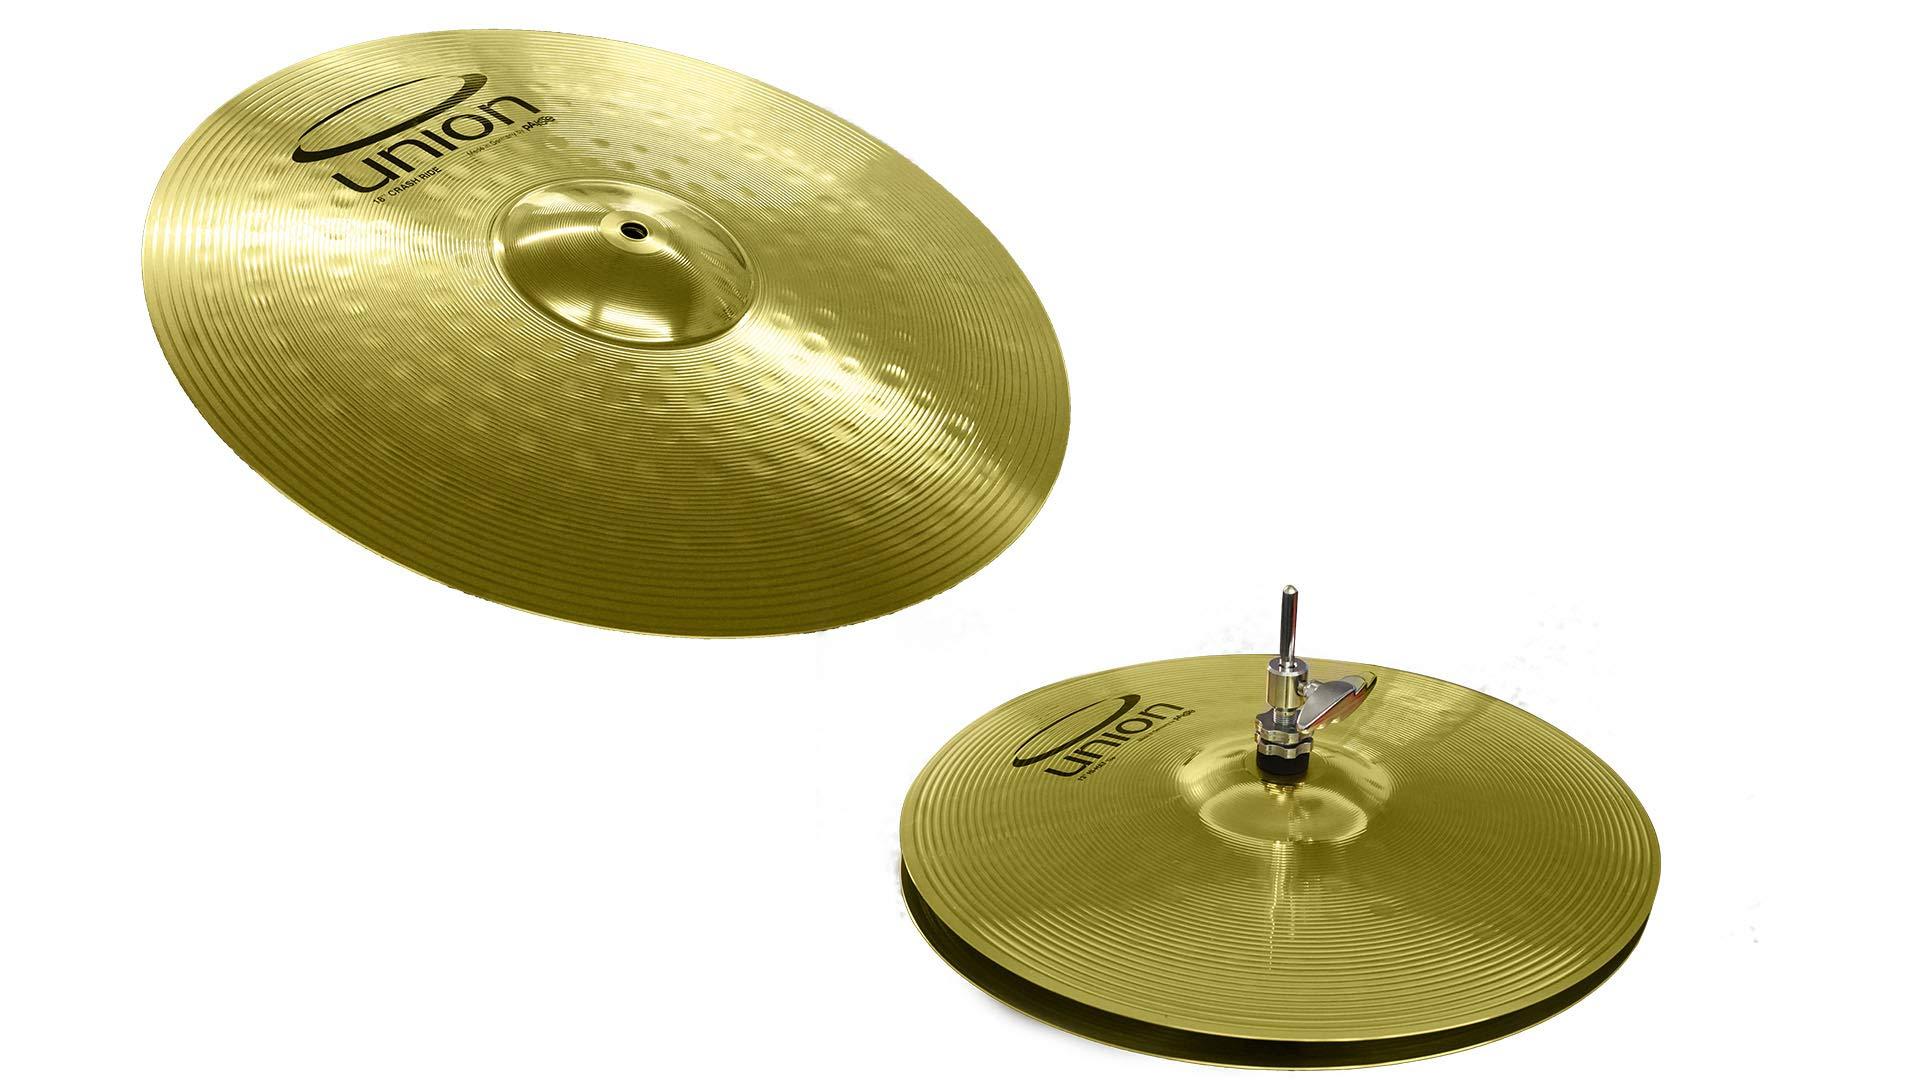 Union by Paiste 3-Piece Brass Cymbal Set 13 inch Hi-Hats/18 inch Crash-Ride OEMBM1KP